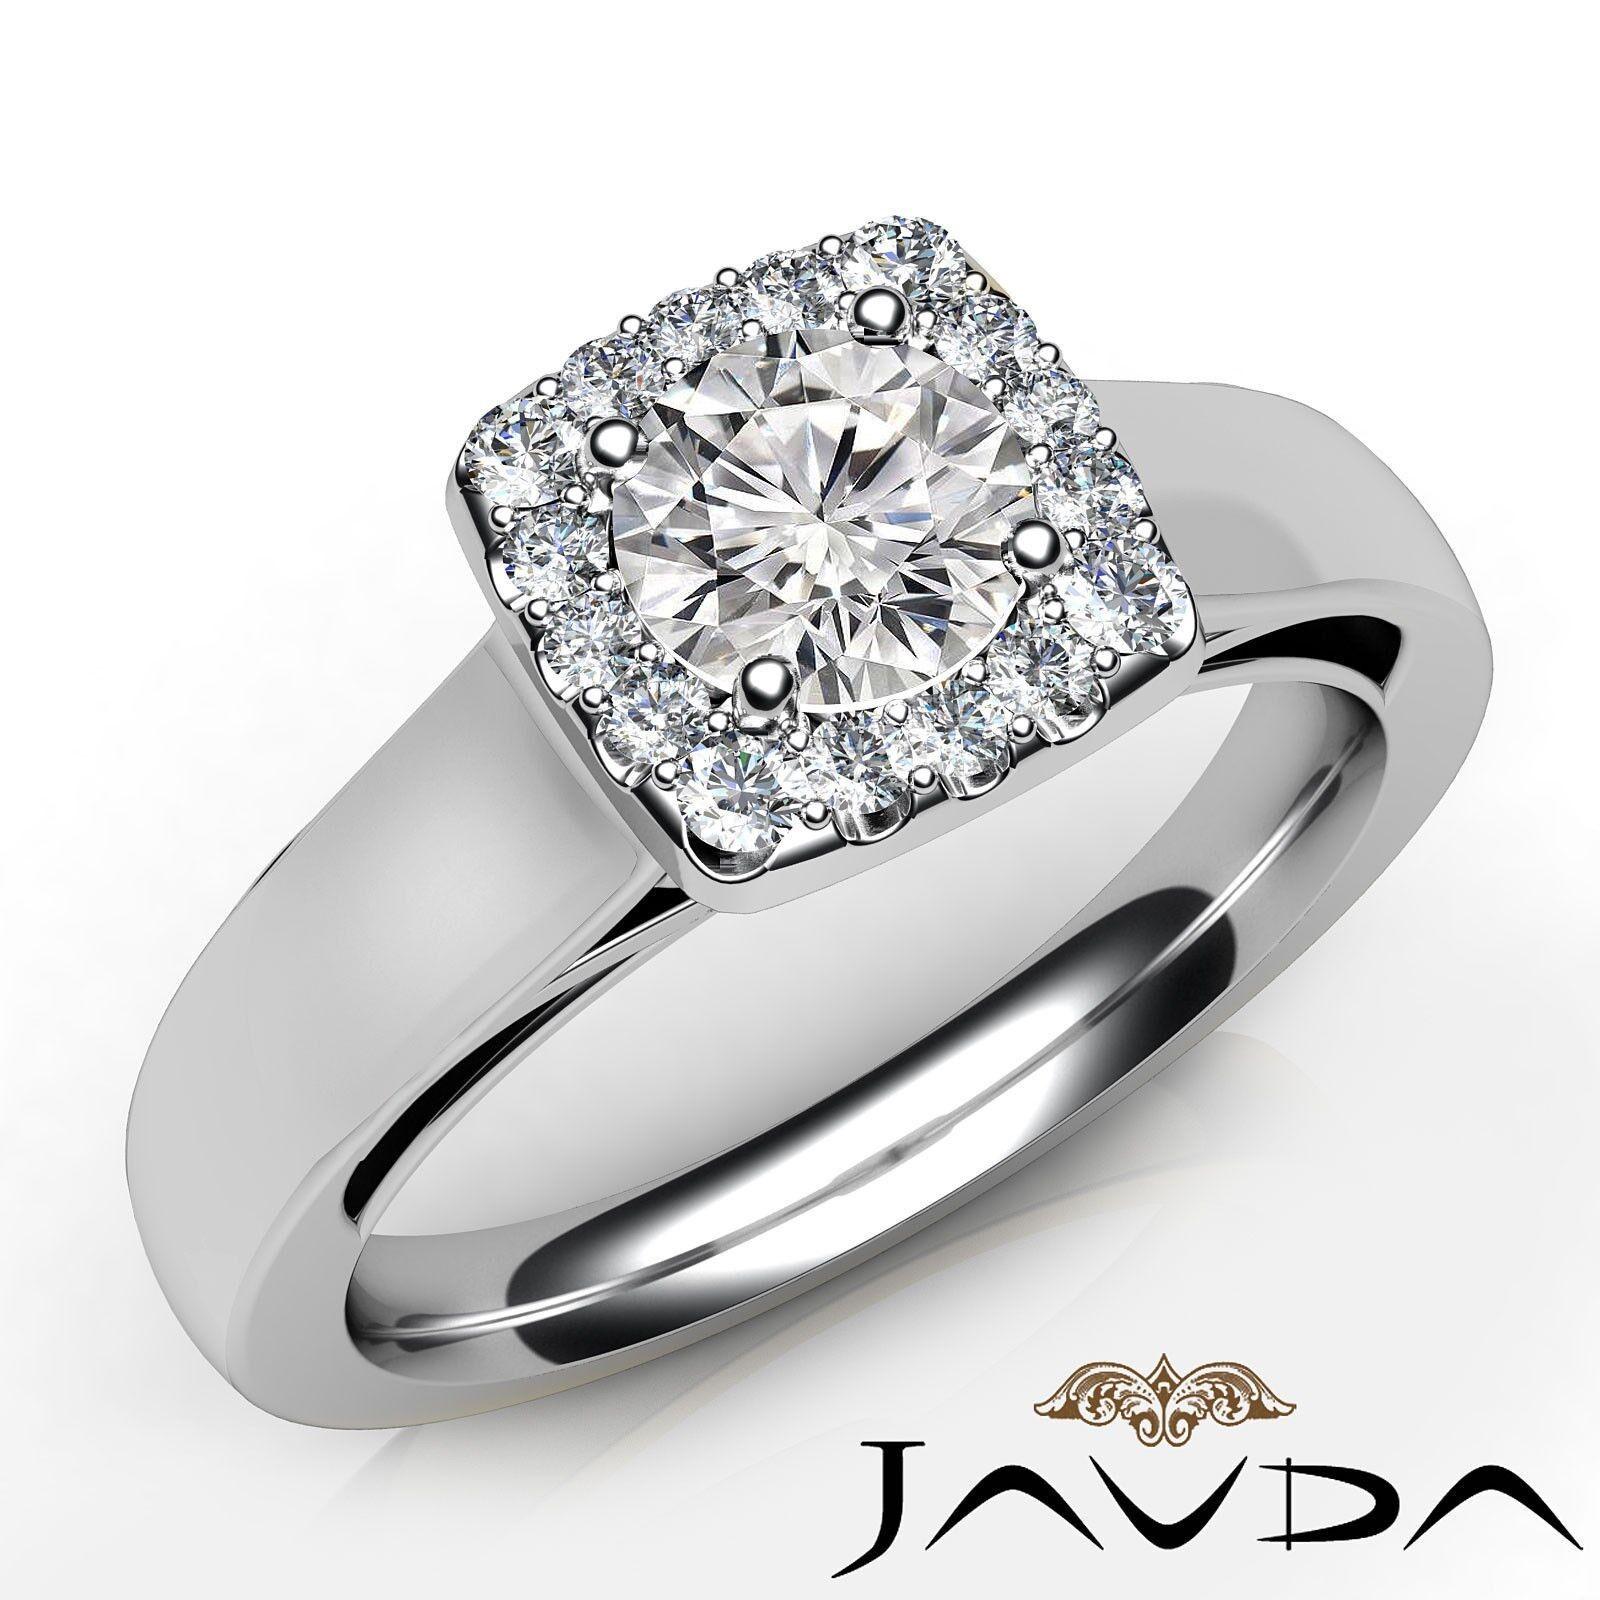 Halo French U Pave Round Diamond Engagement Filigree Shank Ring GIA F SI1 0.7Ct